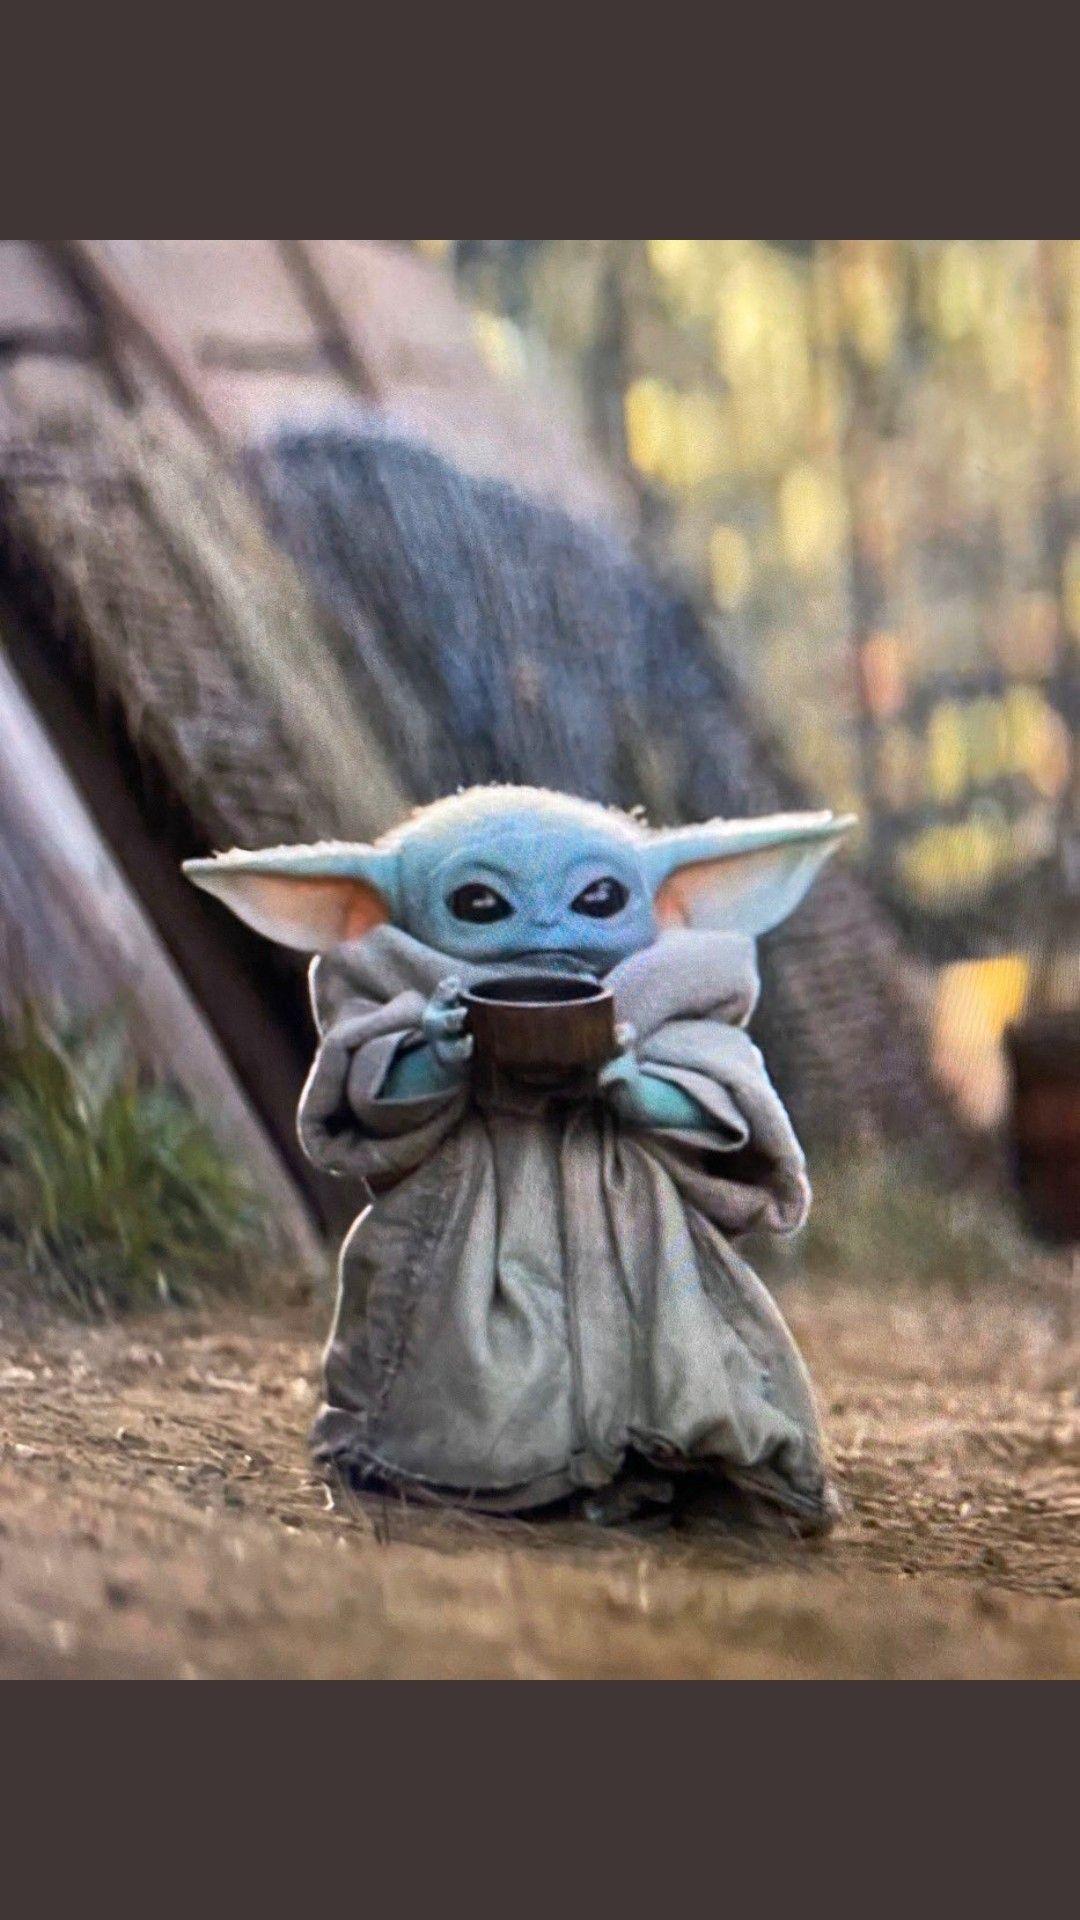 Baby Yoda Yoda Wallpaper Star Wars Poster Star Wars Wallpaper